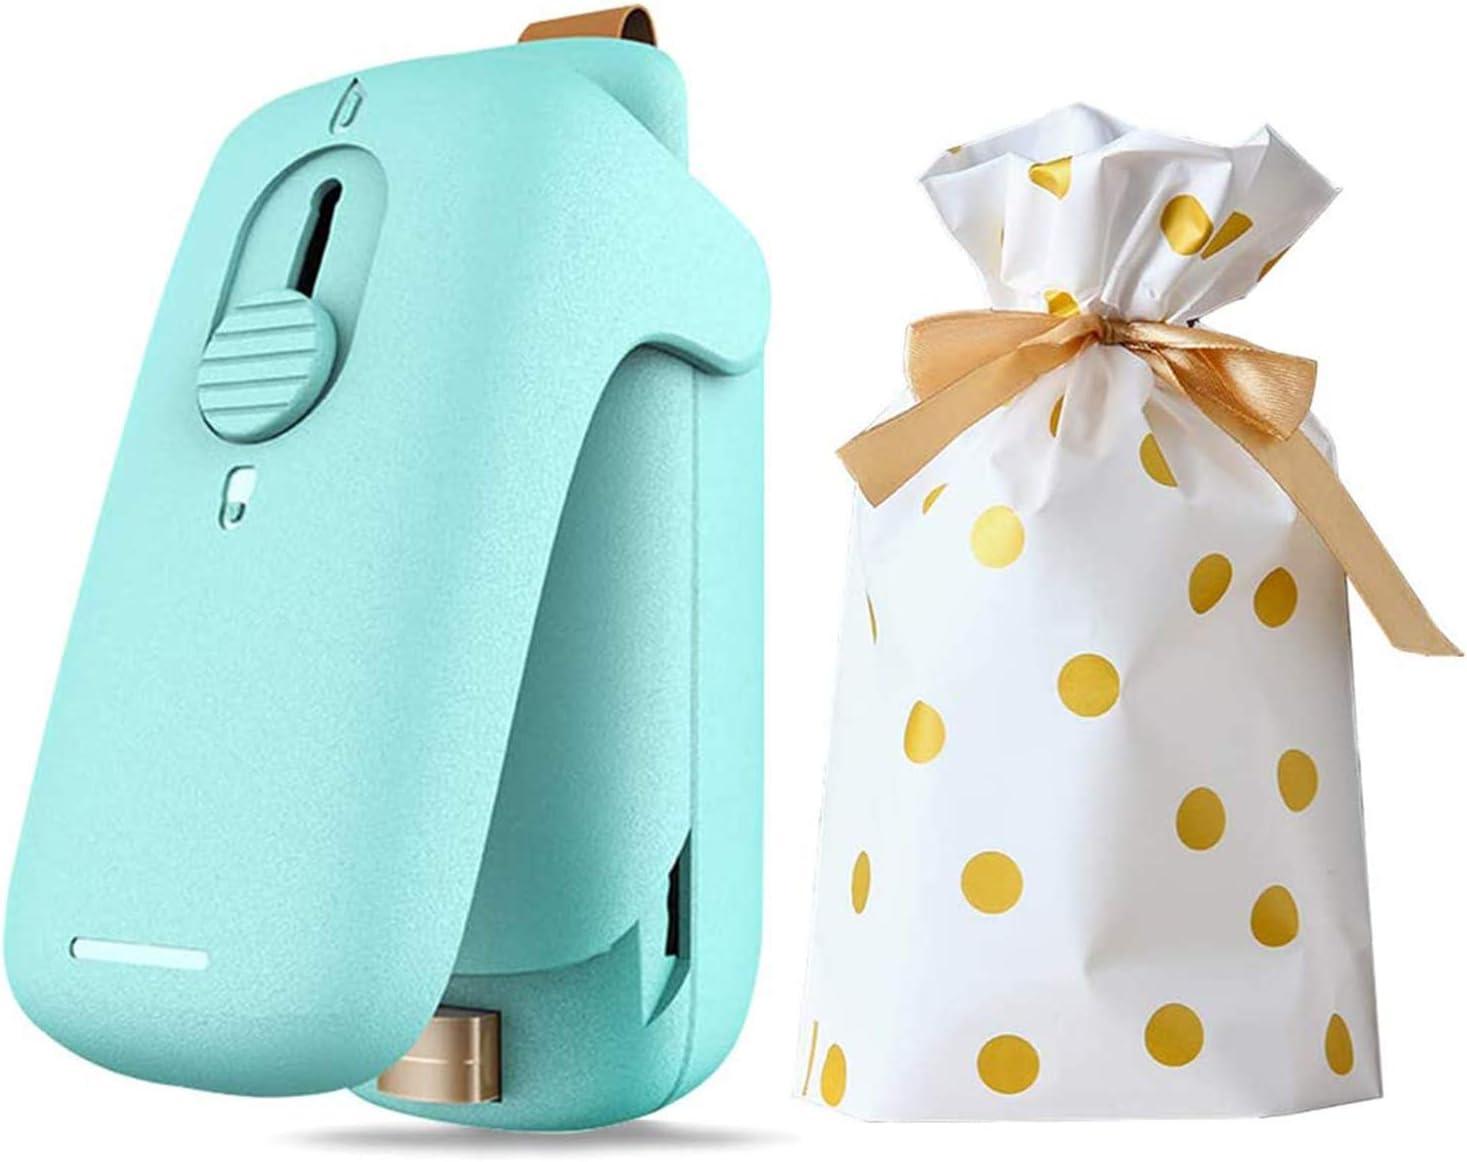 Bag Heat Sealer Mini, 2 in 1 Portable Handheld Heat Vacuum Sealers and Cutter, Bag Resealer Sealer Heat Seal, Plastic Bags Package Food Chip Sealer (Battery Not Included)